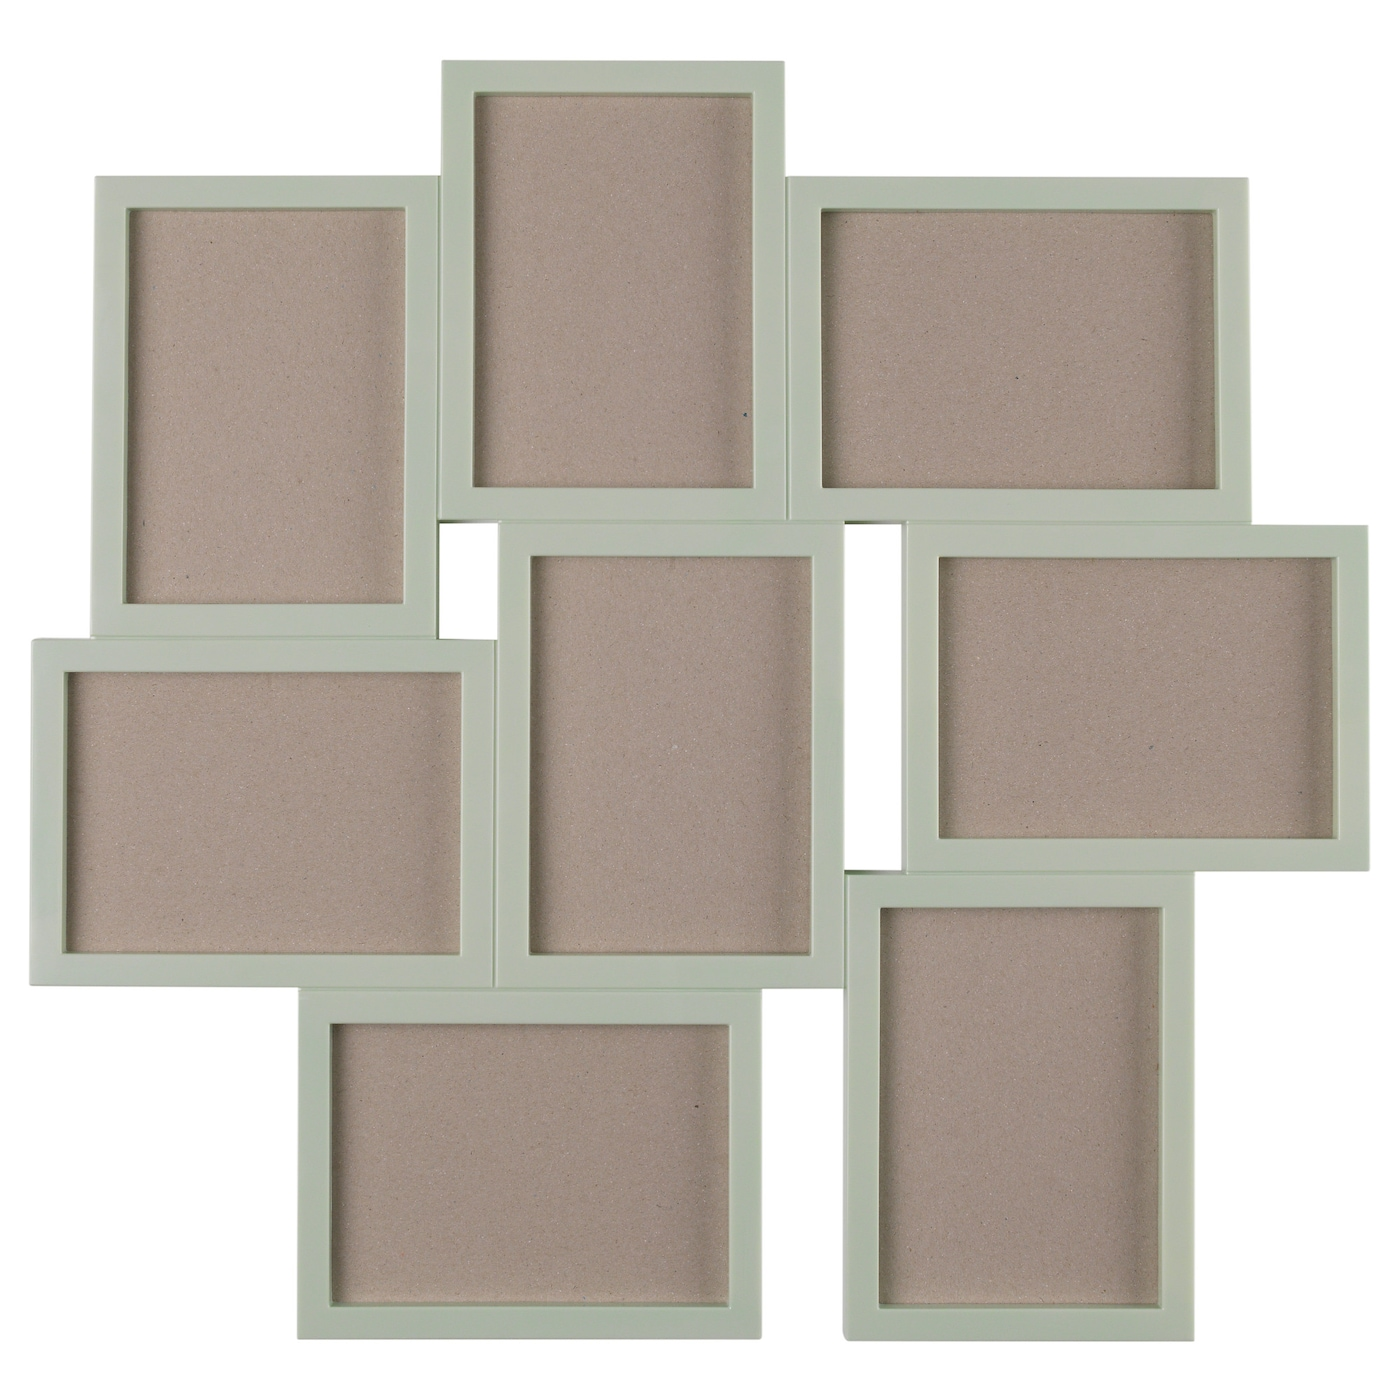 cadres photos ikea. Black Bedroom Furniture Sets. Home Design Ideas